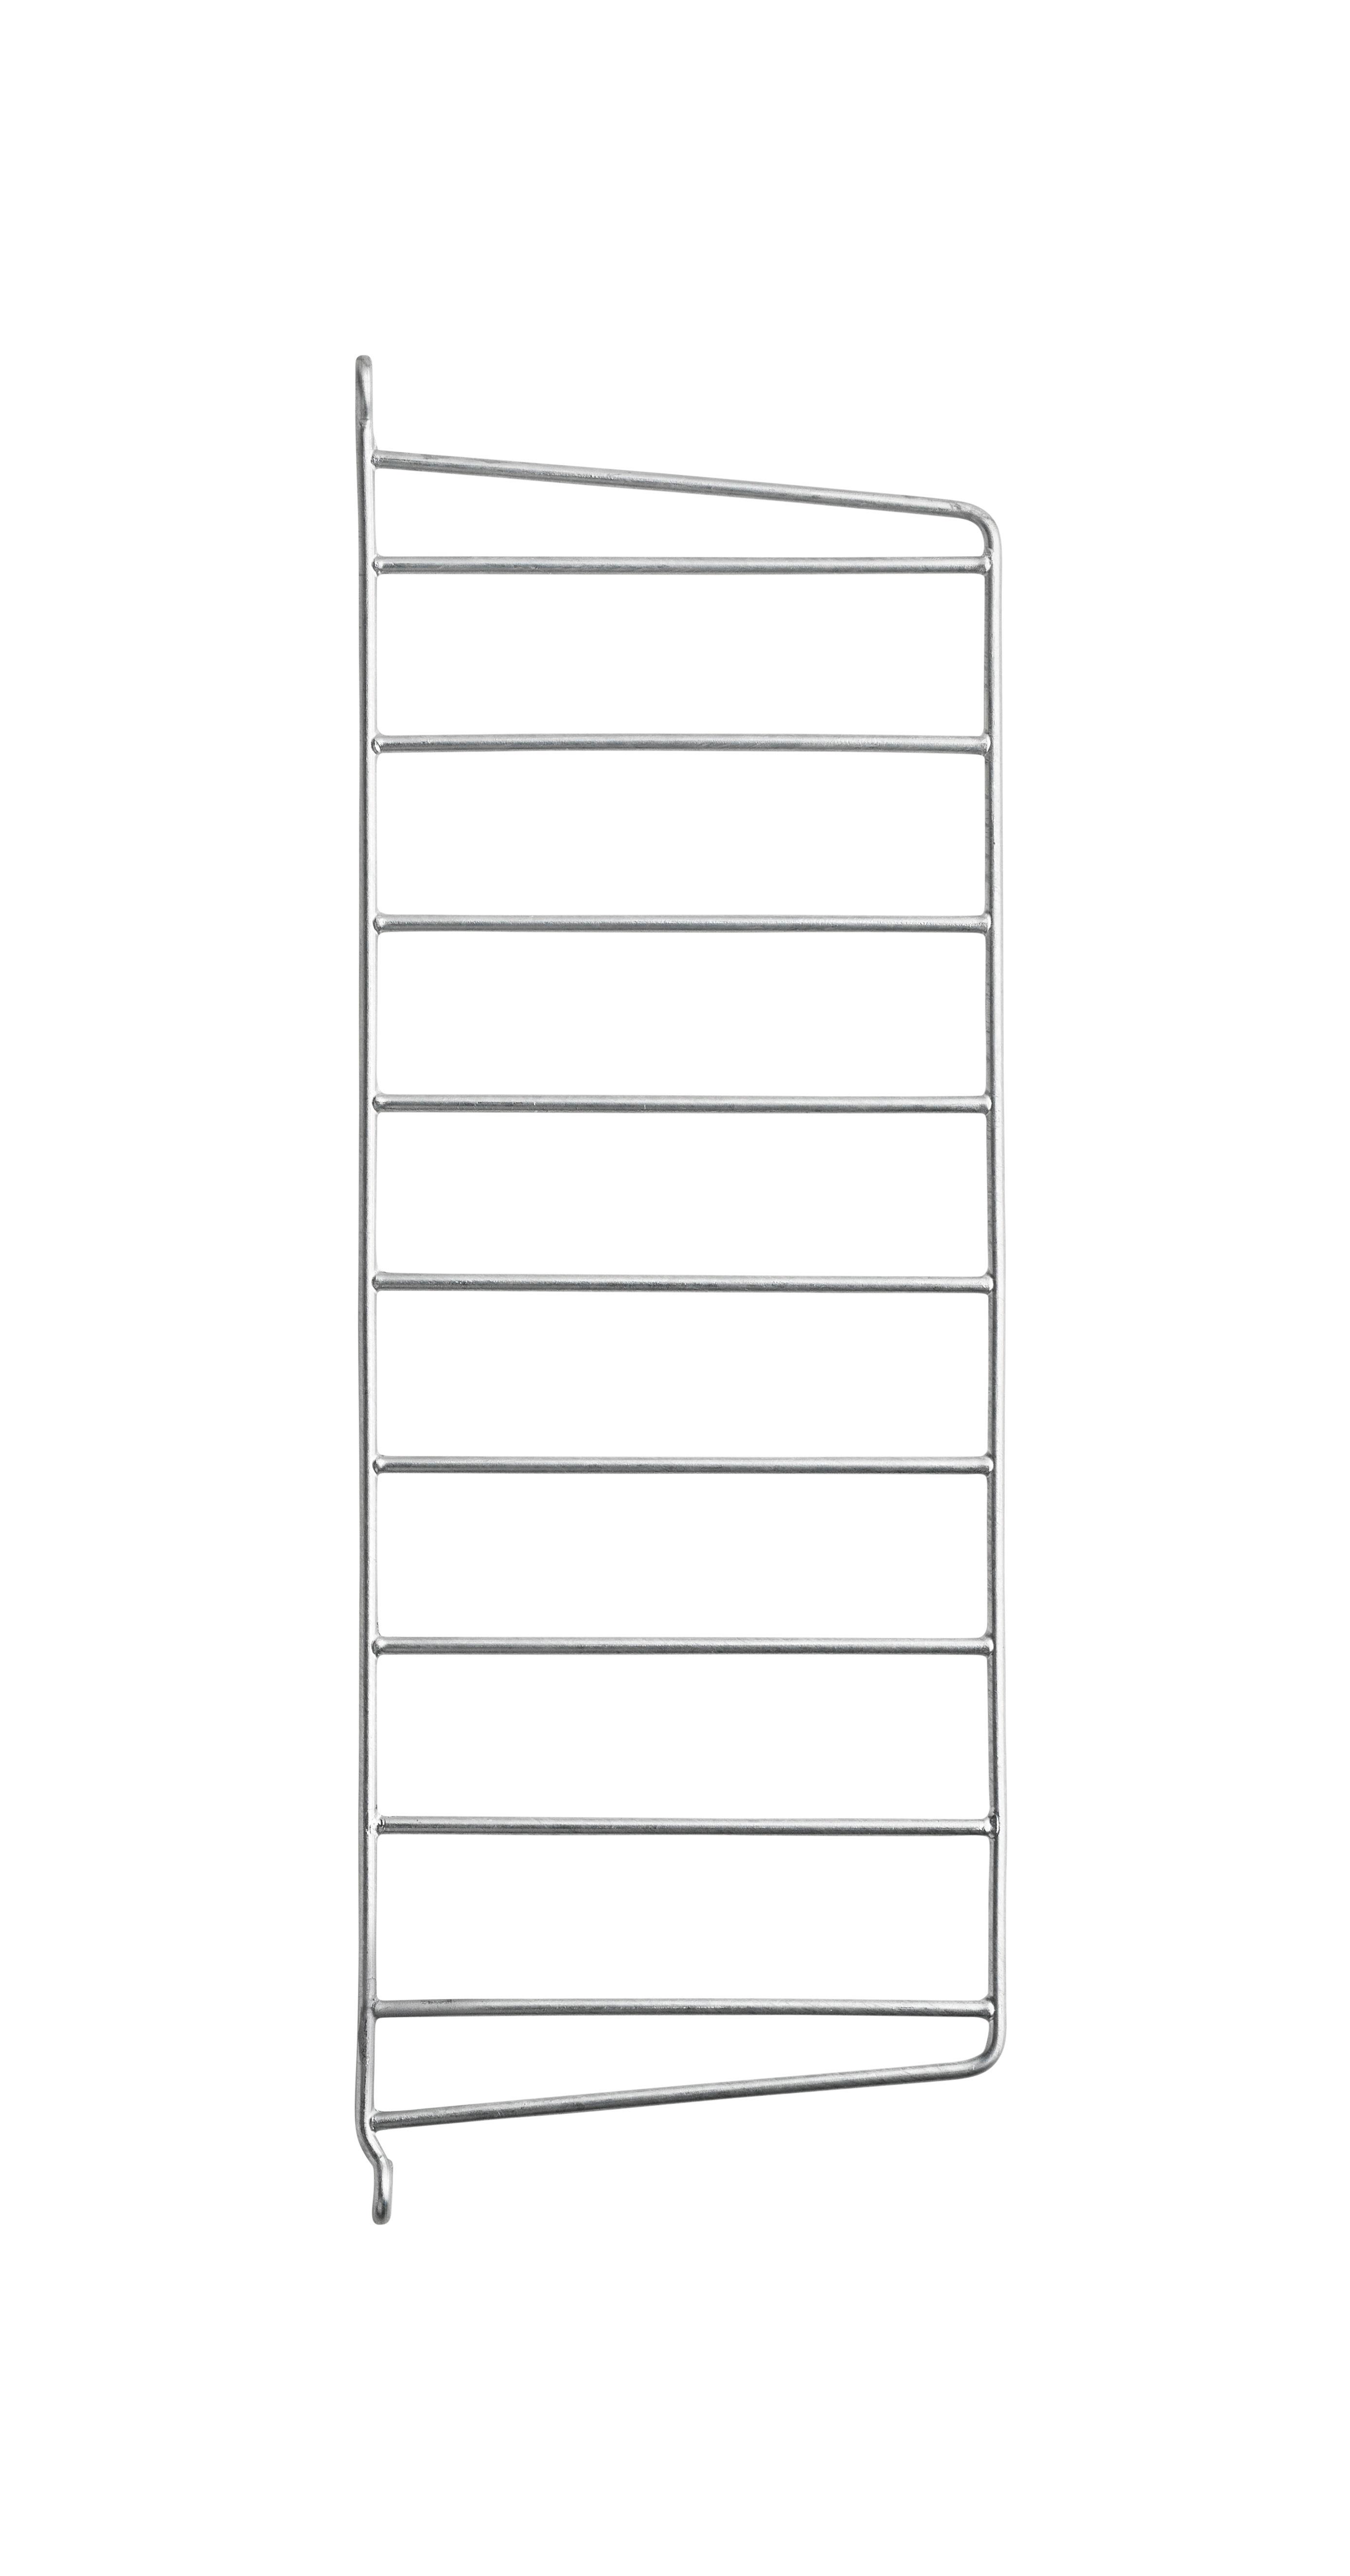 Arredamento - Scaffali e librerie - Montante murale String Outdoor - / Acciaio zincato - H 50 x P 20 cm - ad unità di String Furniture - Unità / Zincato - Acciaio galvanizzato